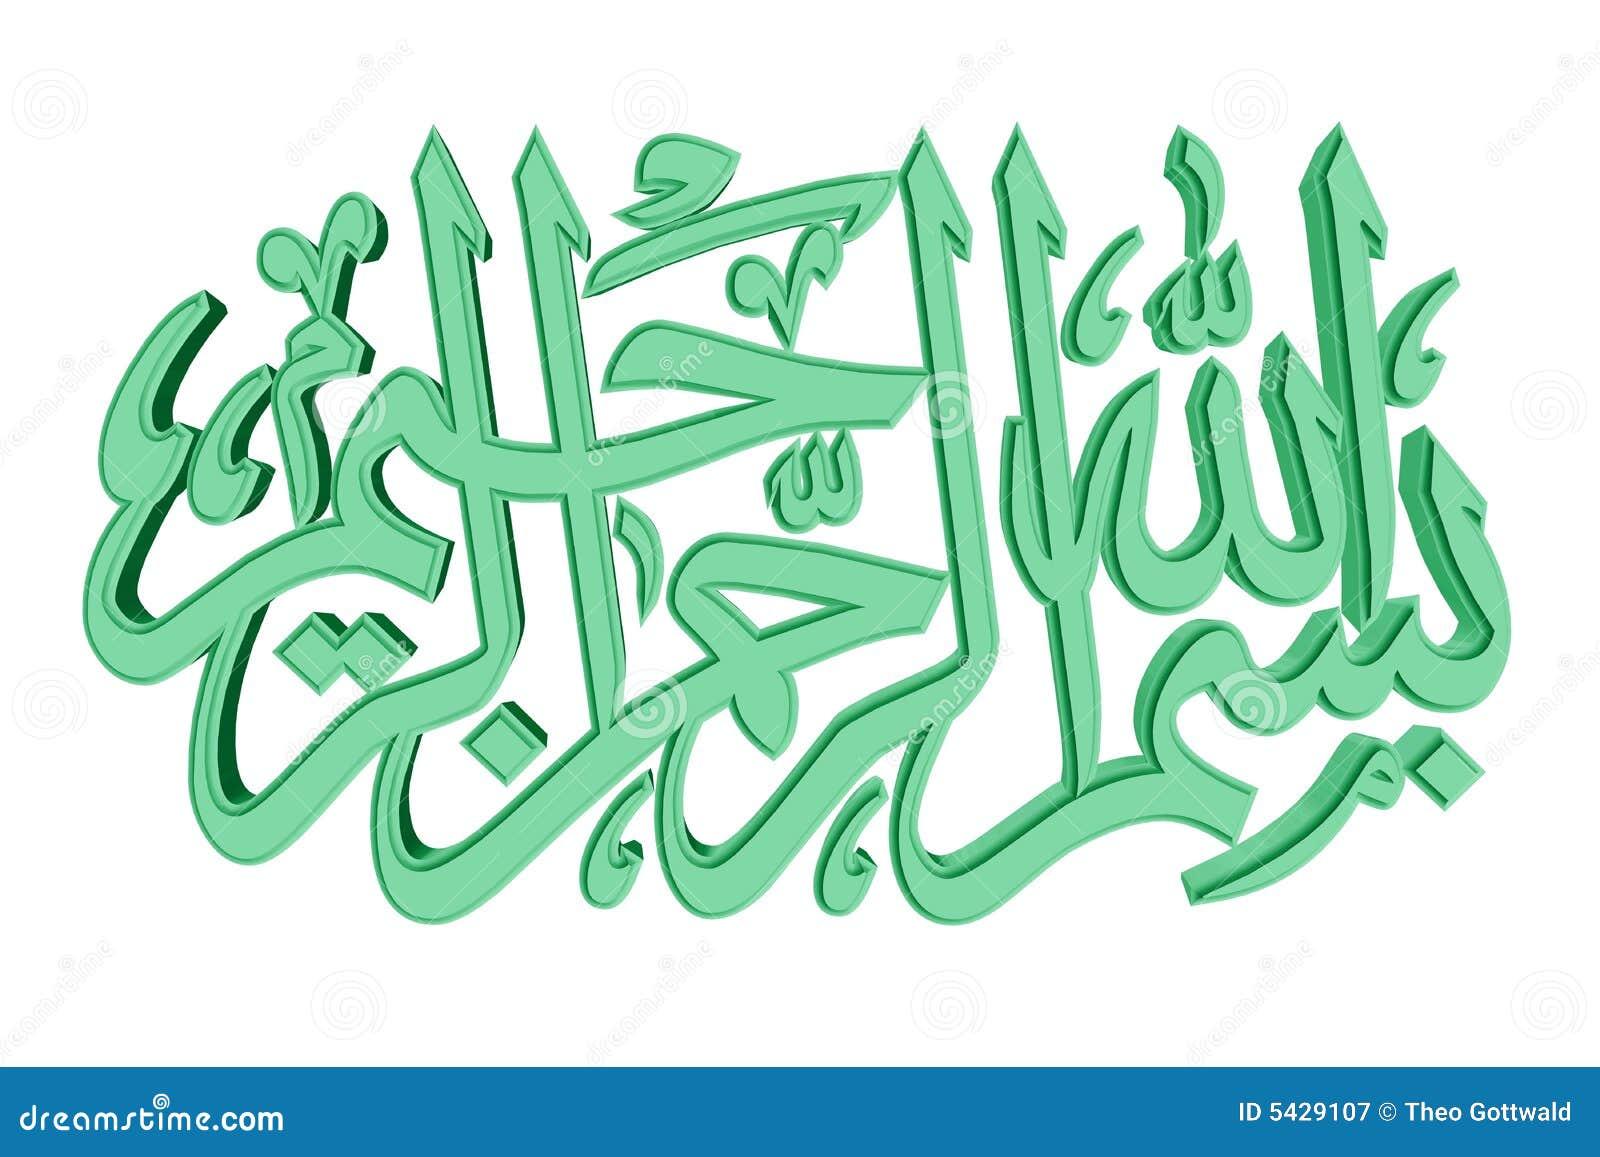 Last Bing Queries Pictures For Islamic Prayer Symbol